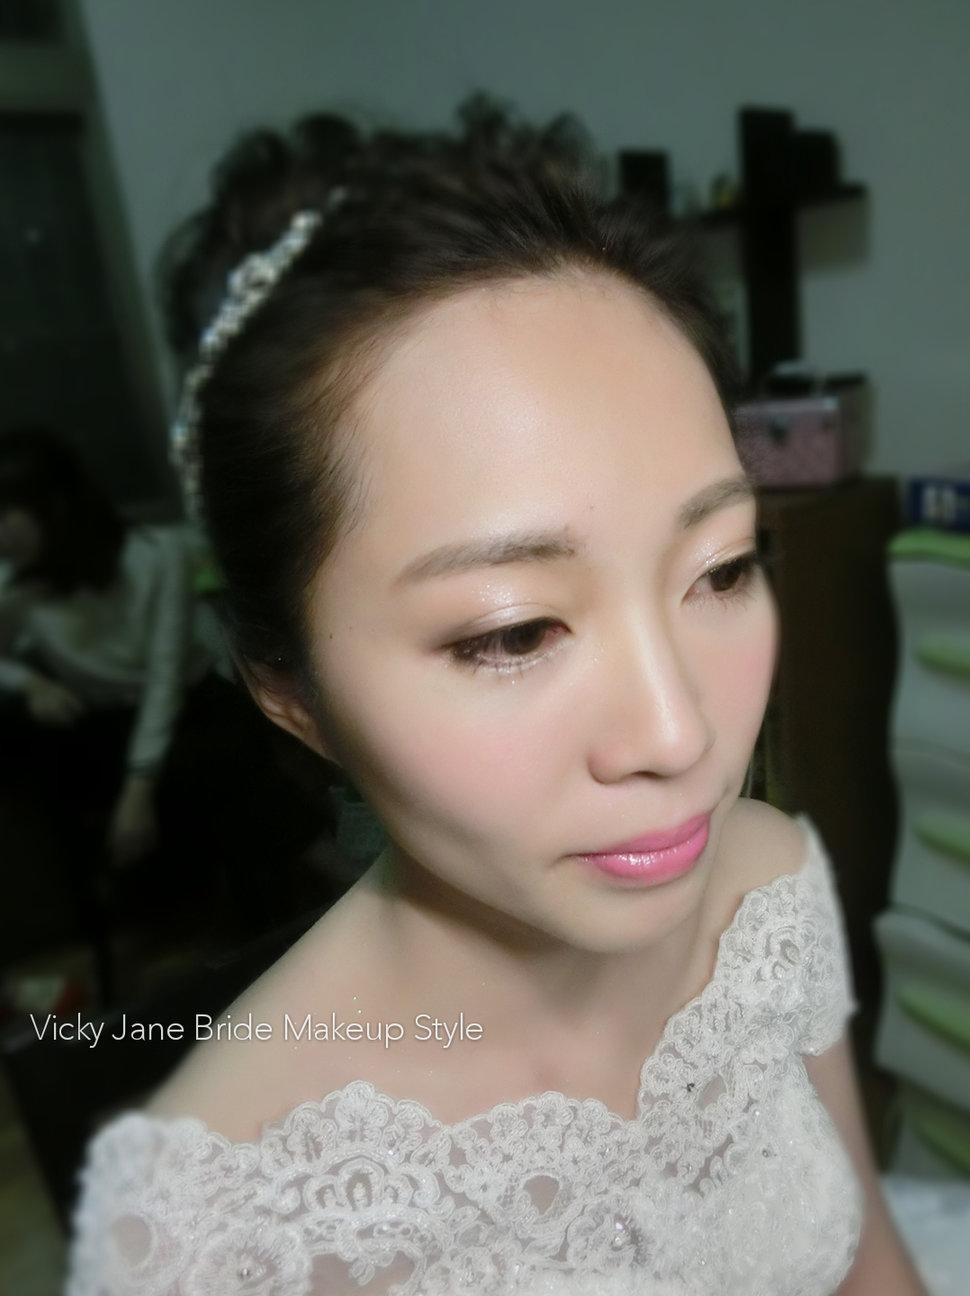 IMG_9950 - Vicky Jane makeup《結婚吧》